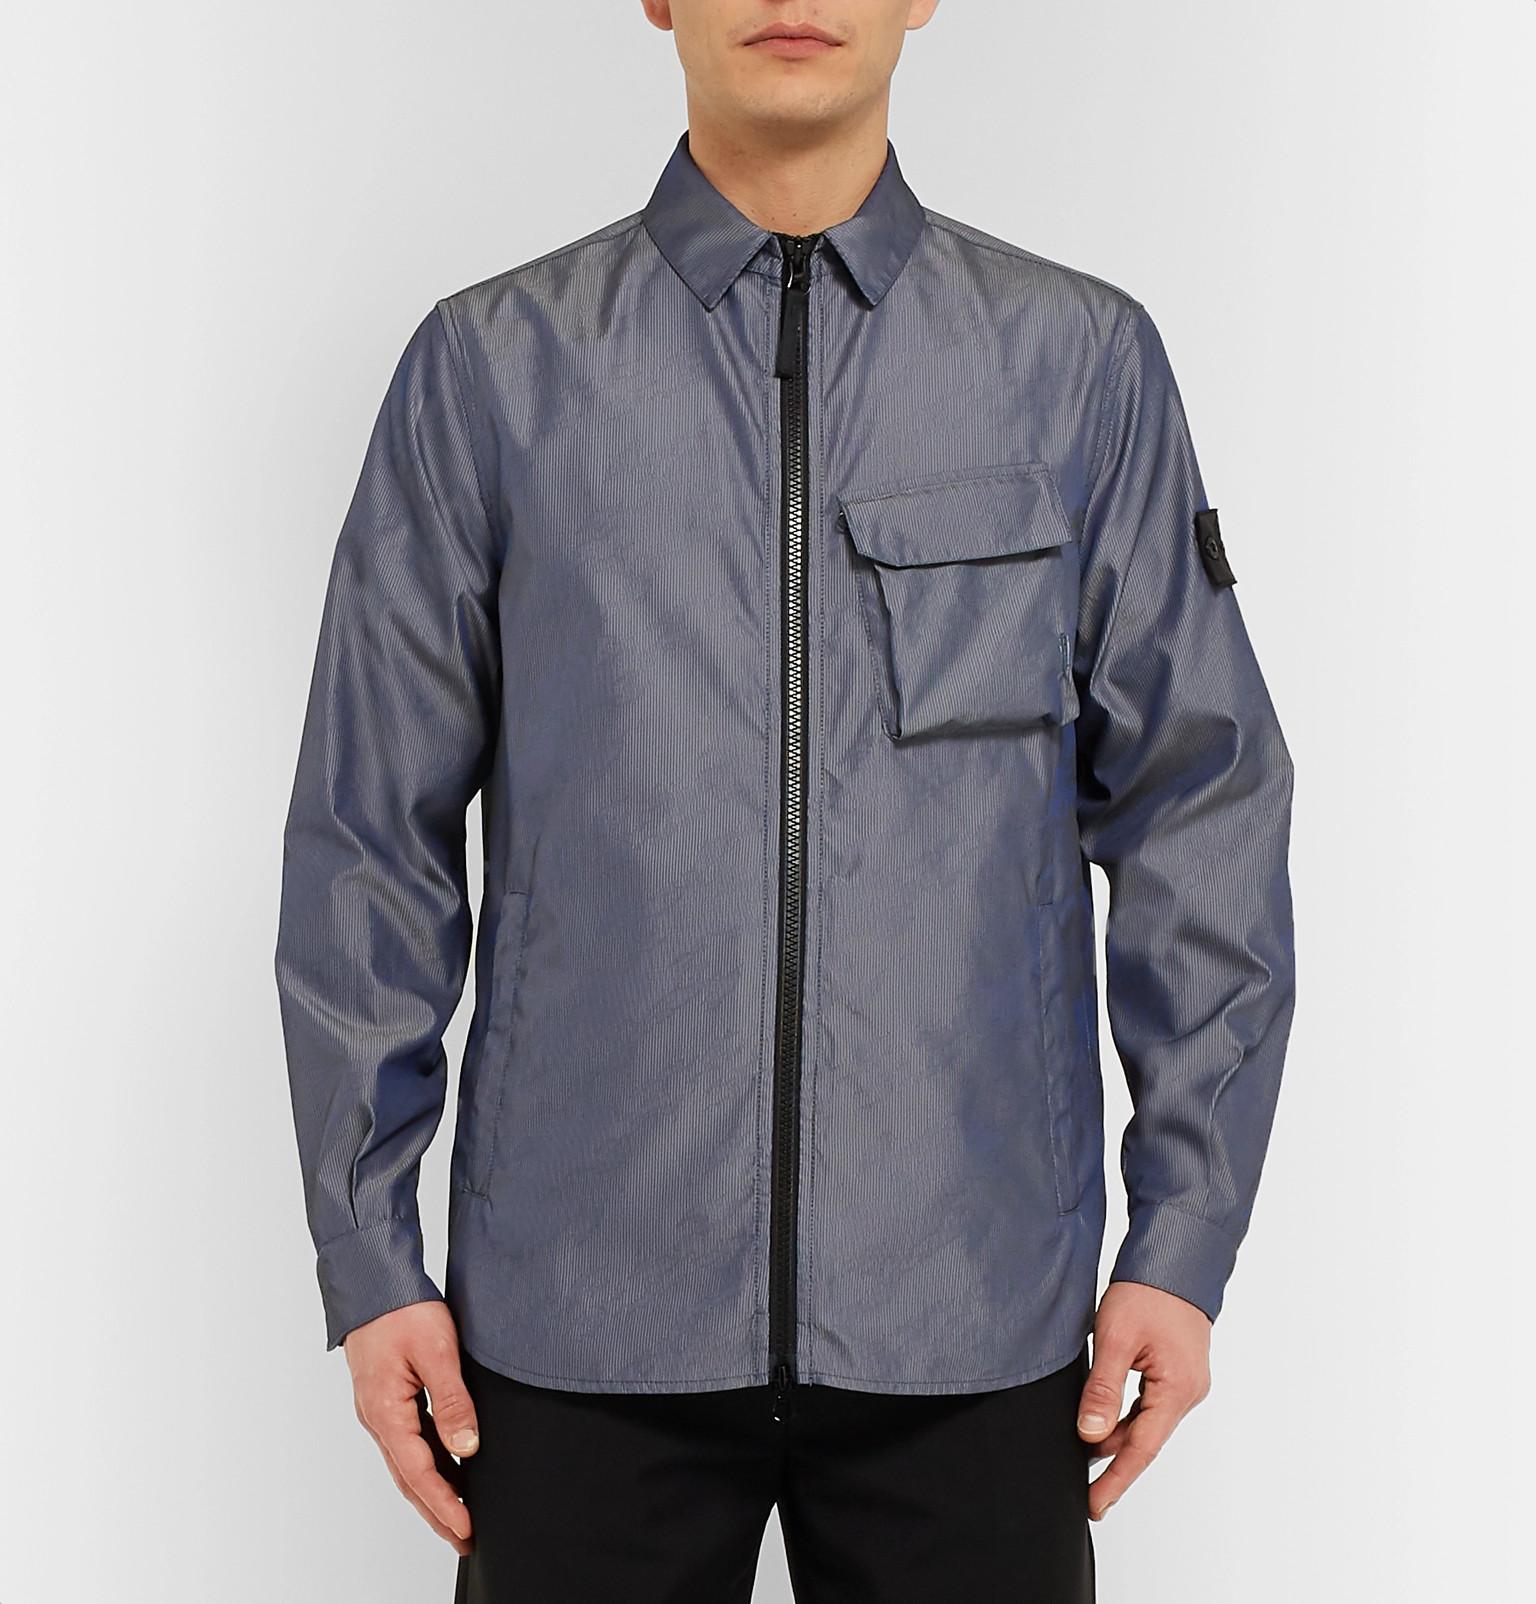 80ca66d5c5a4ae Stone Island Shadow Project - Lenticular Jacquard Shell Shirt Jacket